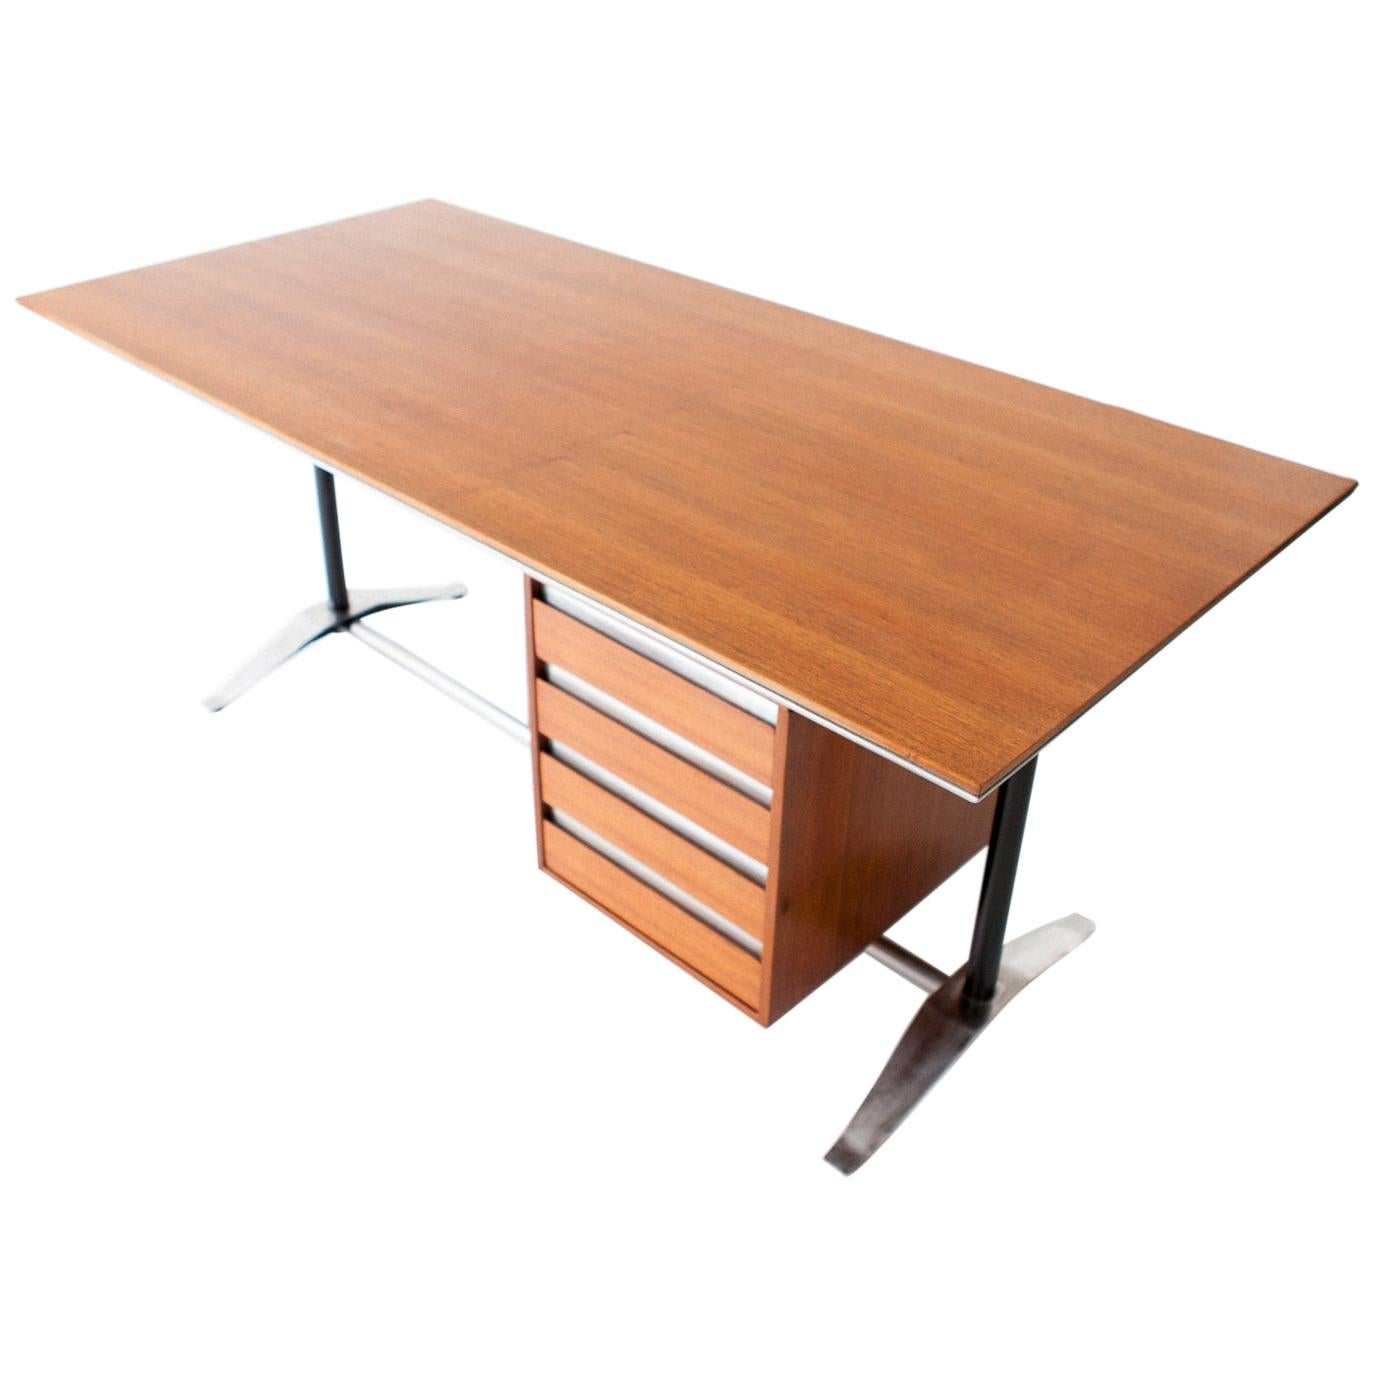 Fully Restored 1950s Desk by Studio PFR Ponti Fornaroli Rosselli